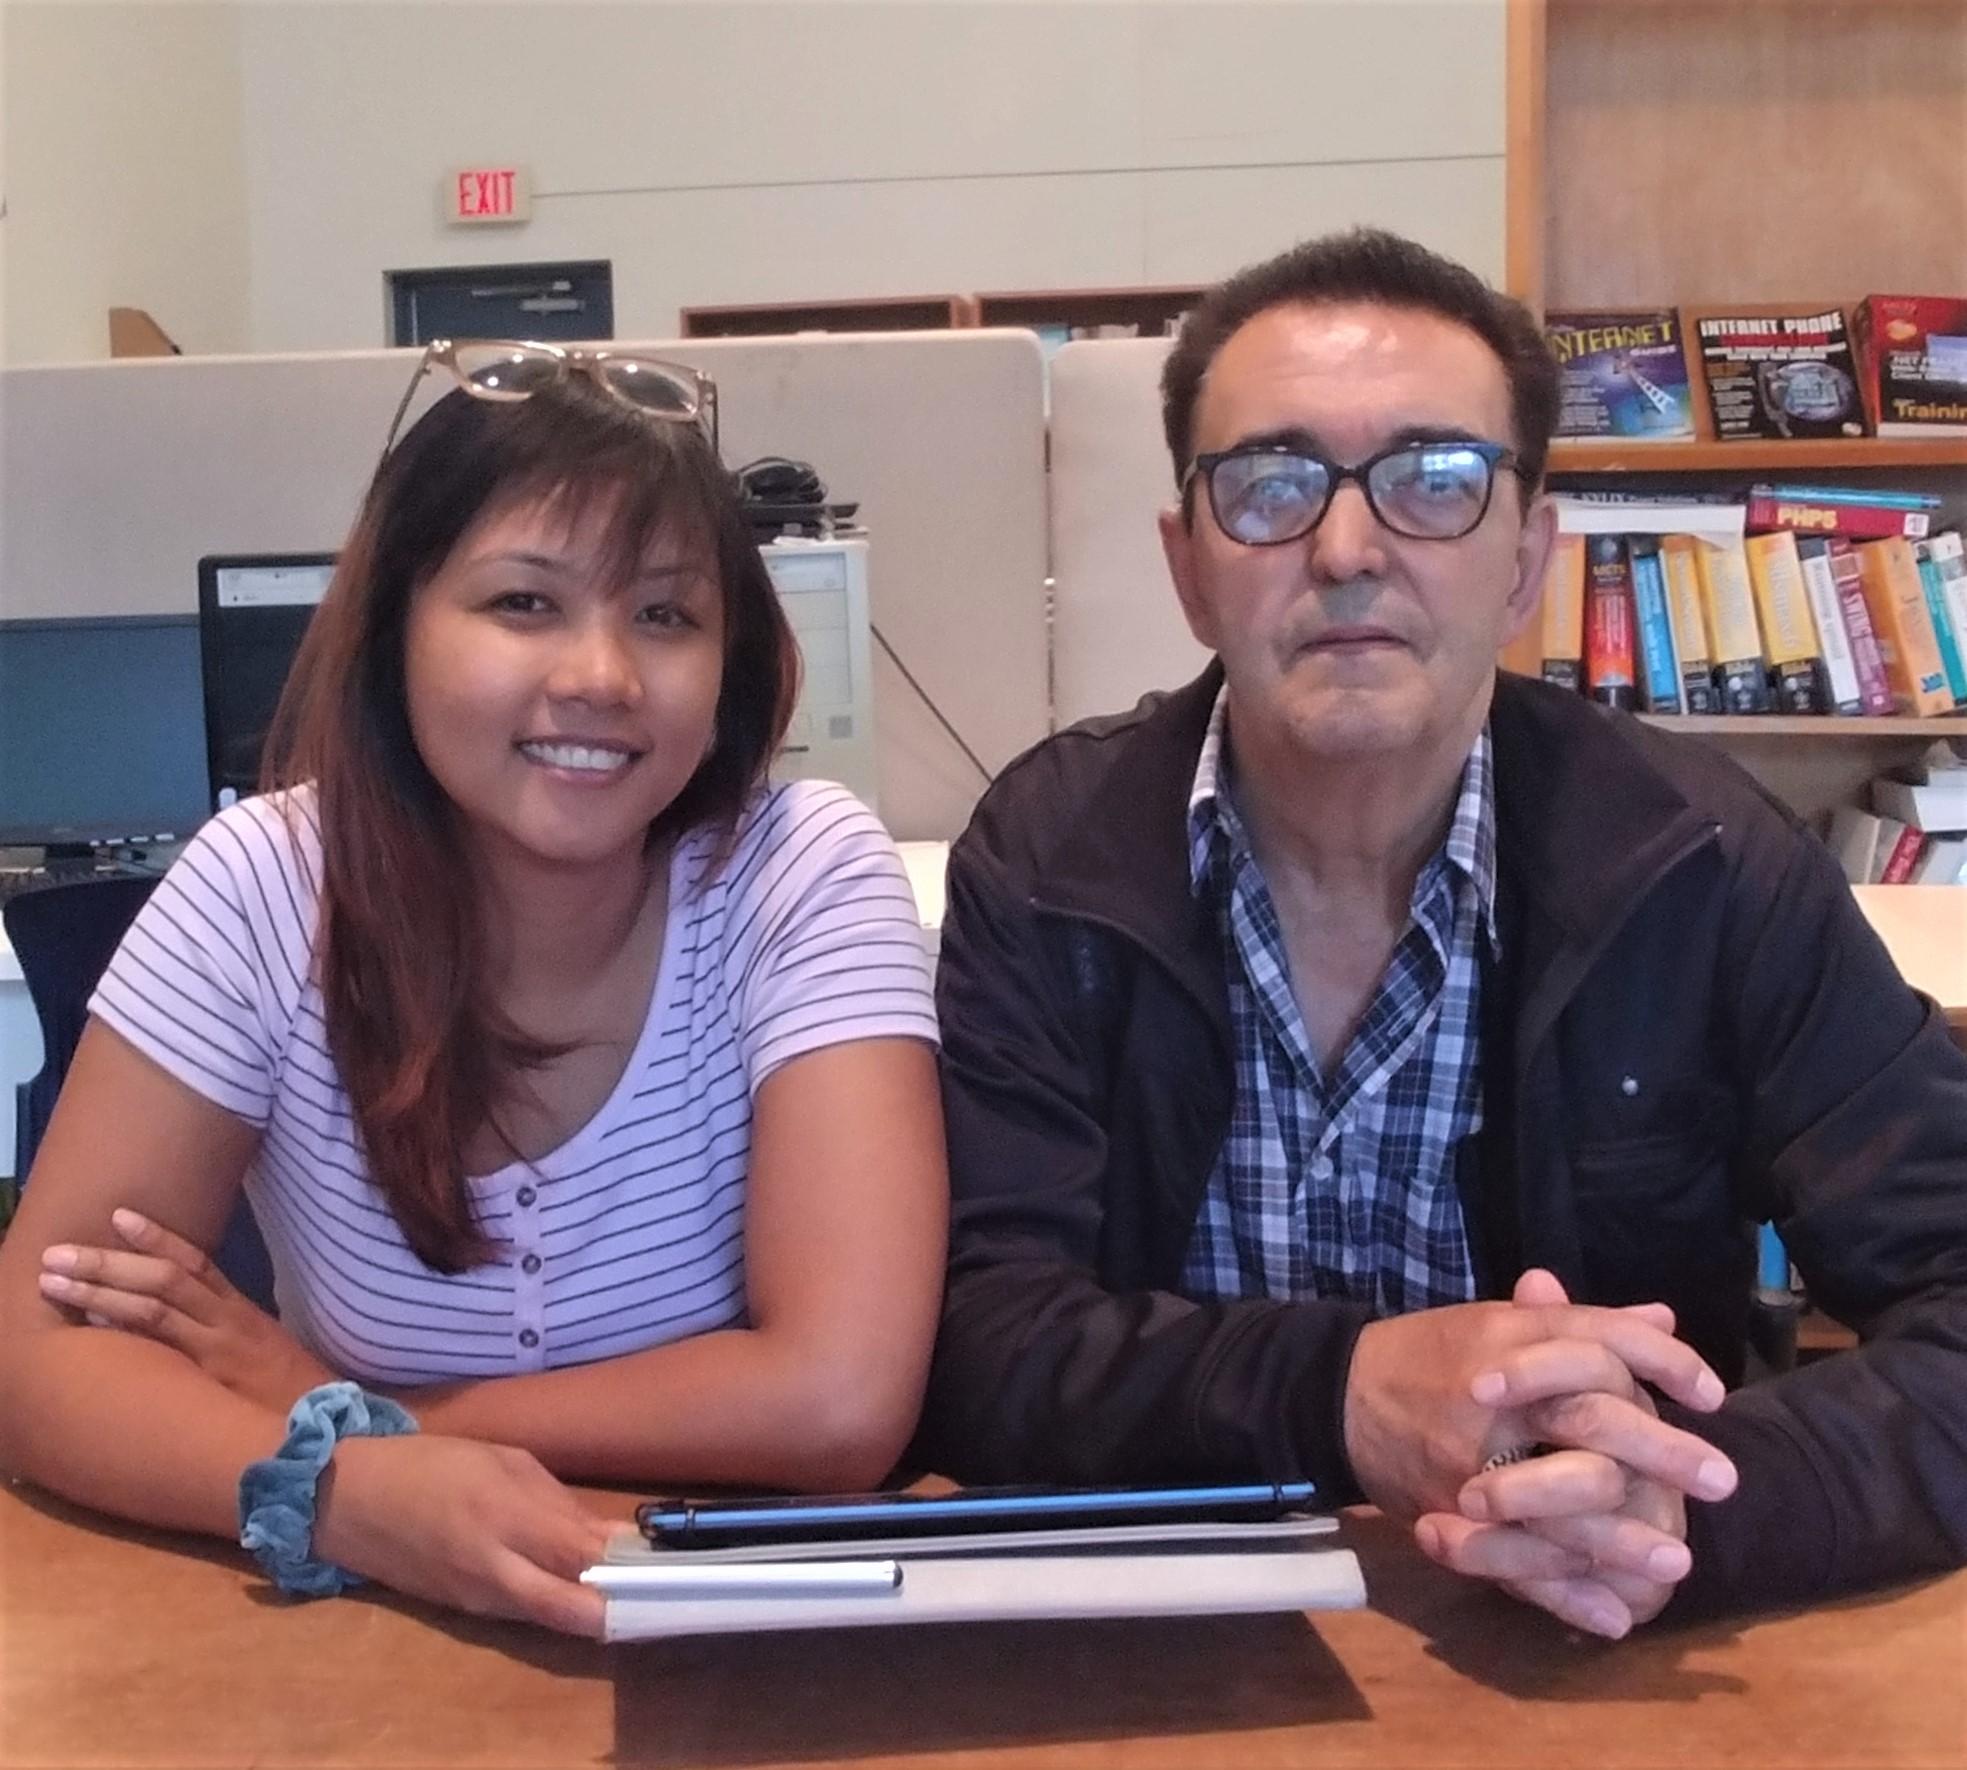 Katrina (volunteer) and John (participant), Bang the Drum Computer Program